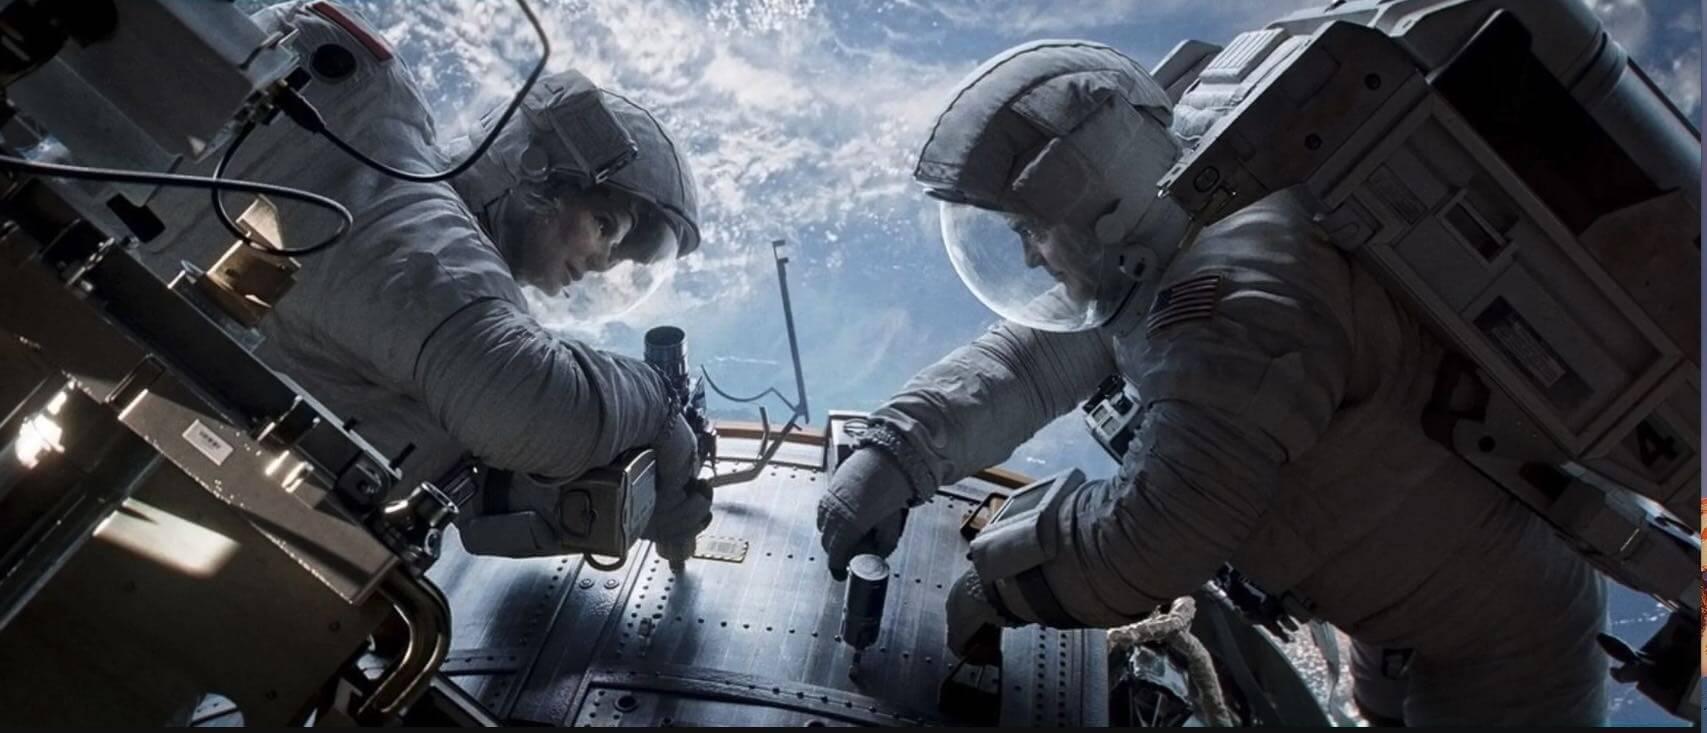 Alfonso Cuaron Movies - Gravity Opening Scene